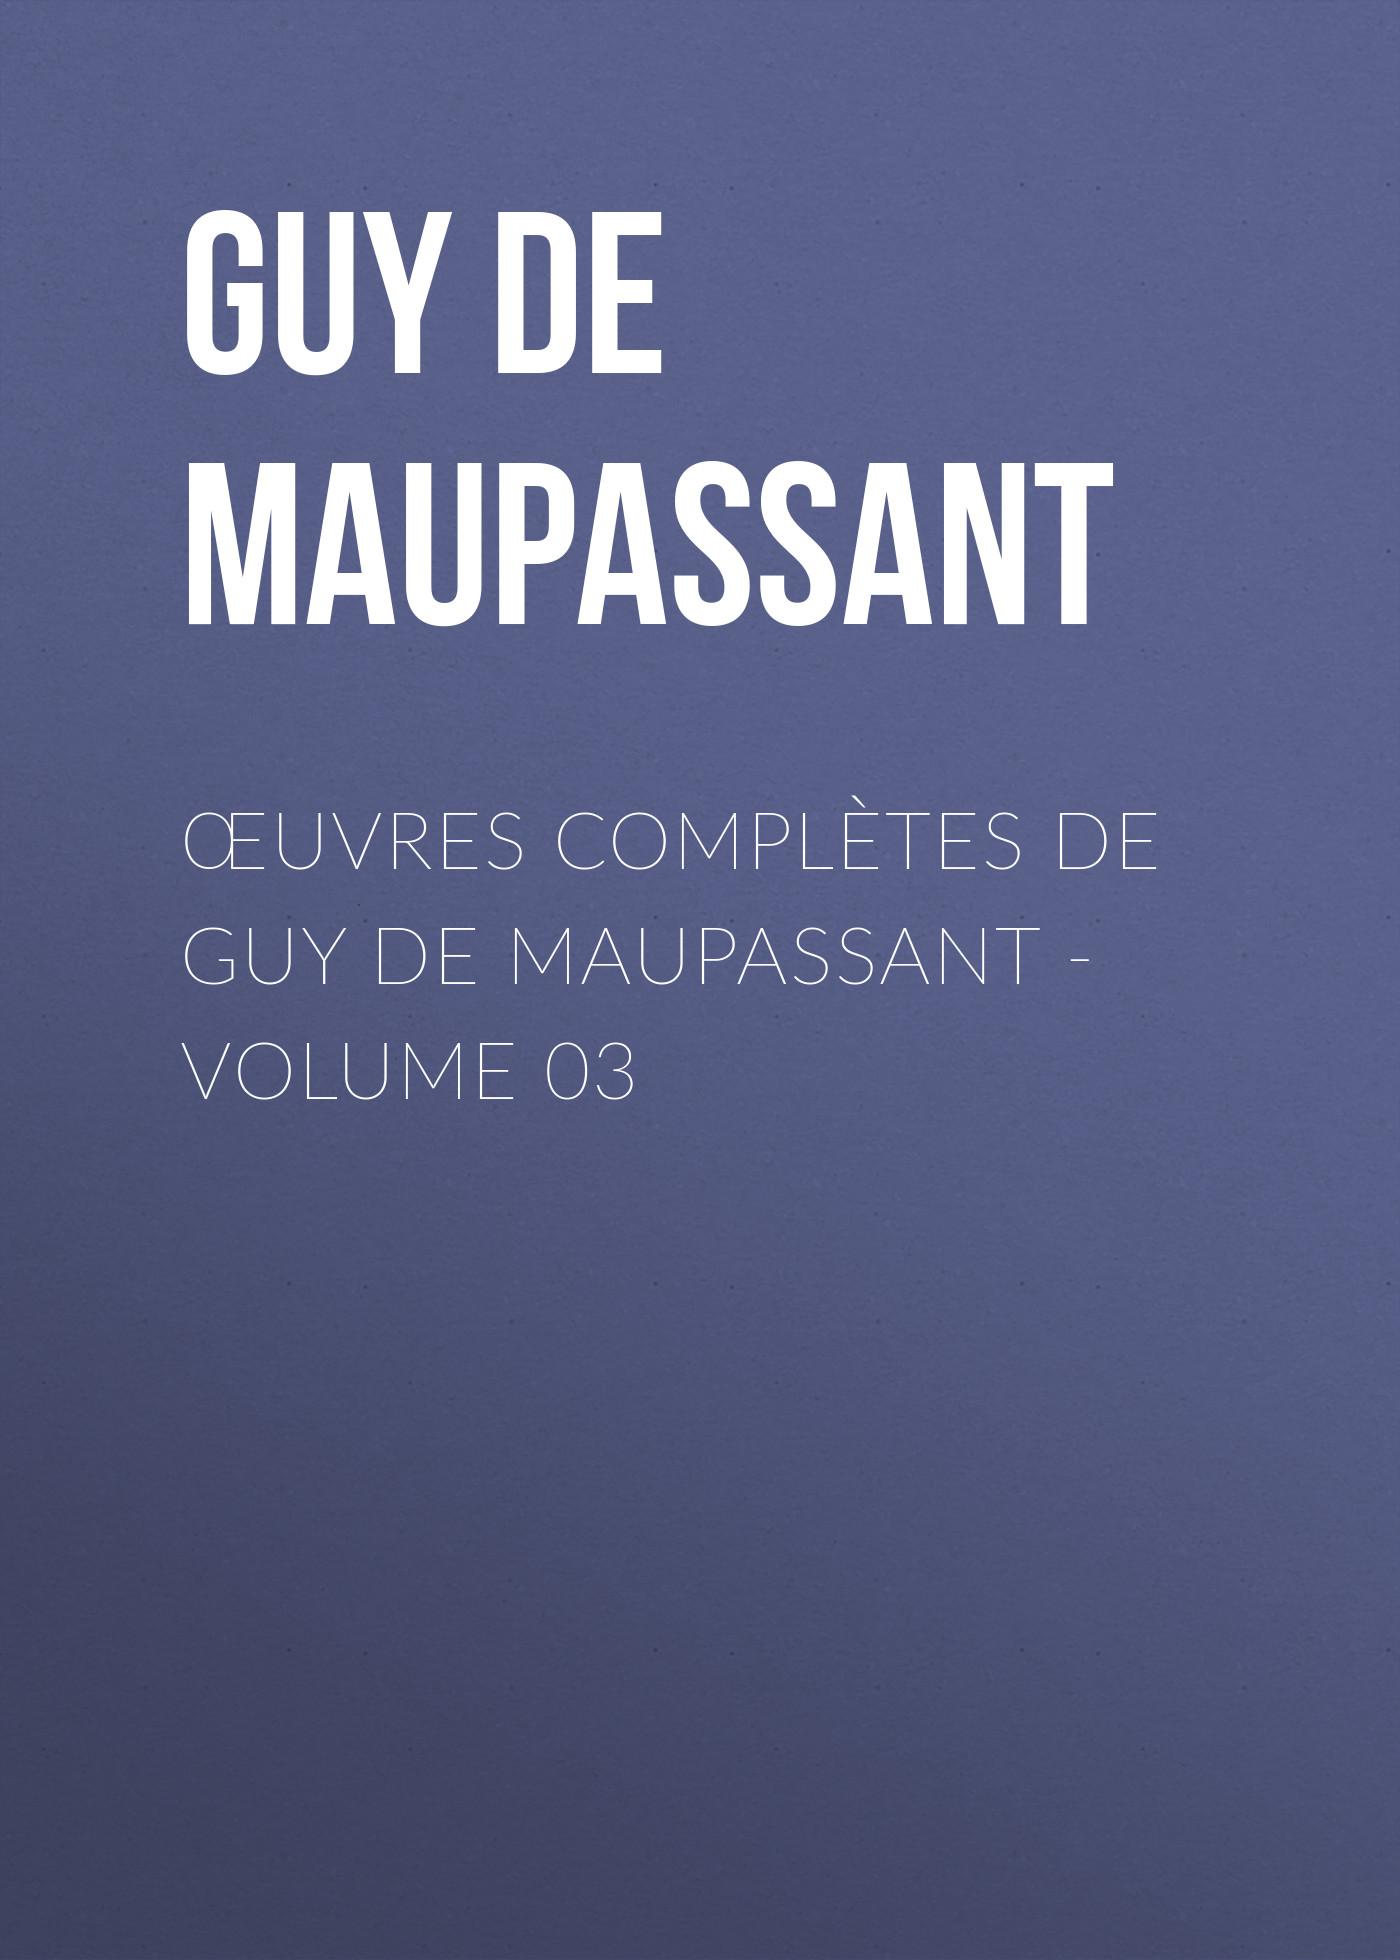 цена на Ги де Мопассан Œuvres complètes de Guy de Maupassant - volume 03